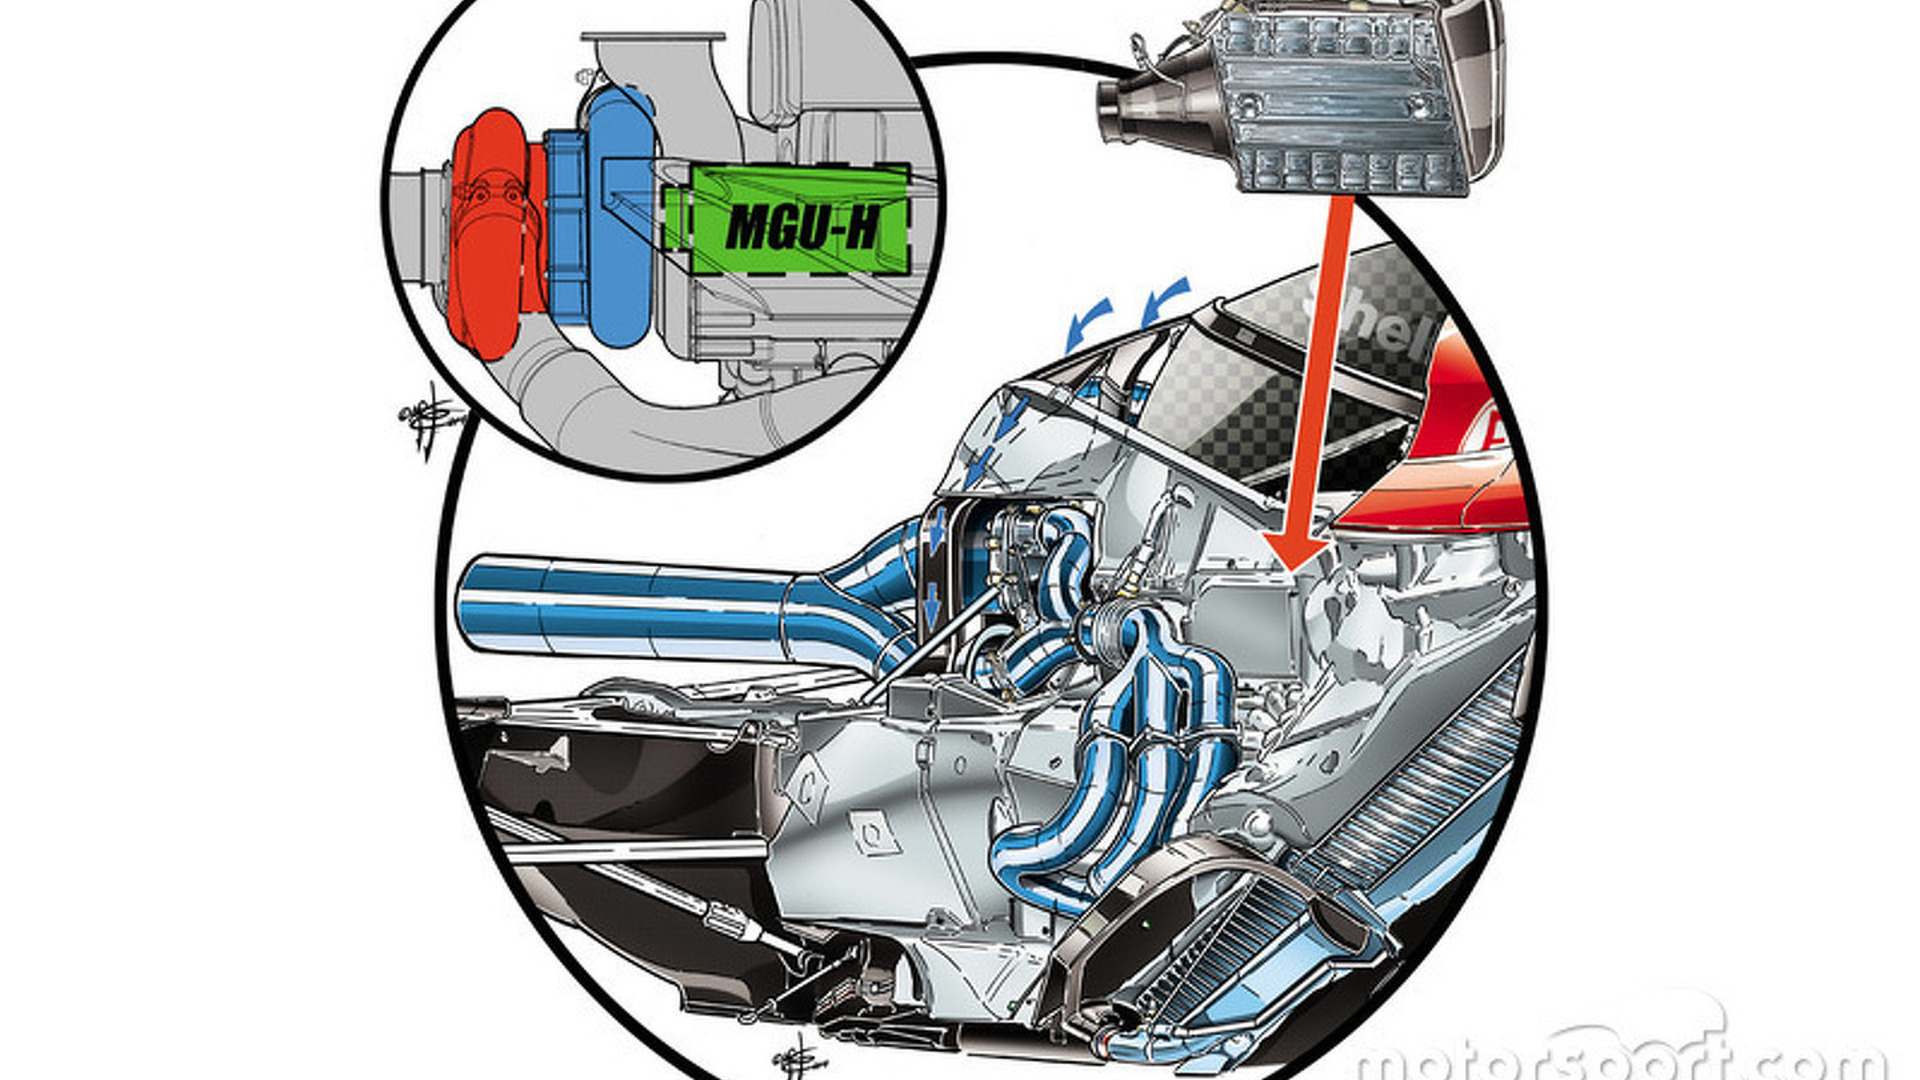 hight resolution of hybrid engine diagram of mclaren s